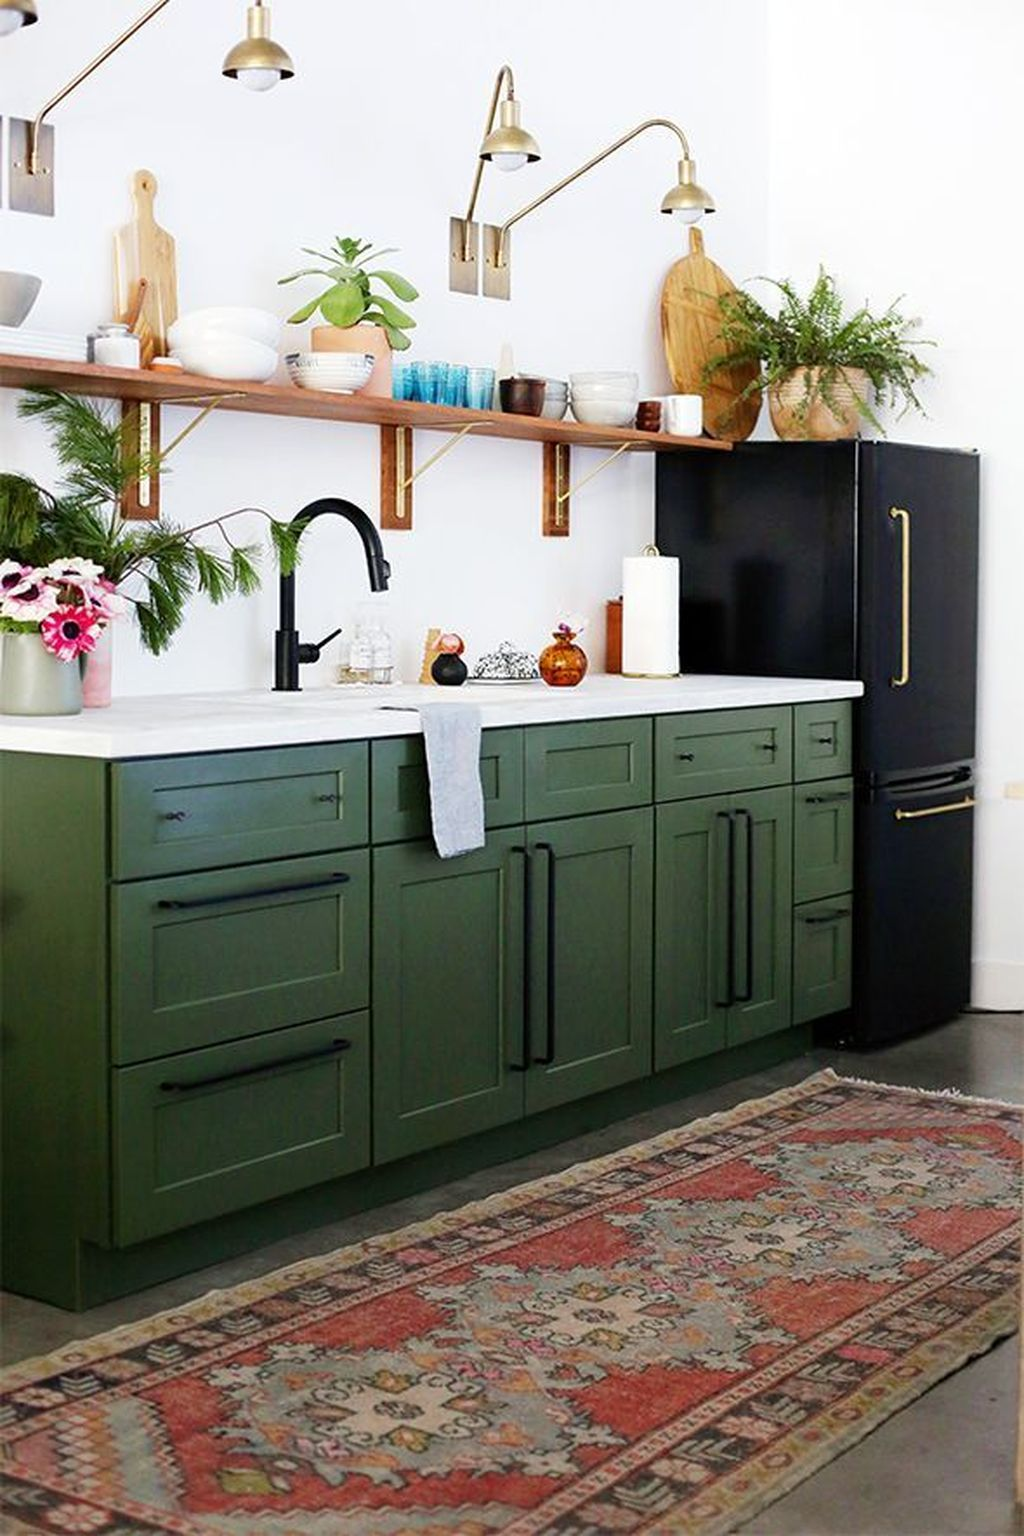 30 Lovely Colorful Kitchen Decorating Ideas Green Kitchen Cabinets Cheap Kitchen Makeover Kitchen Renovation